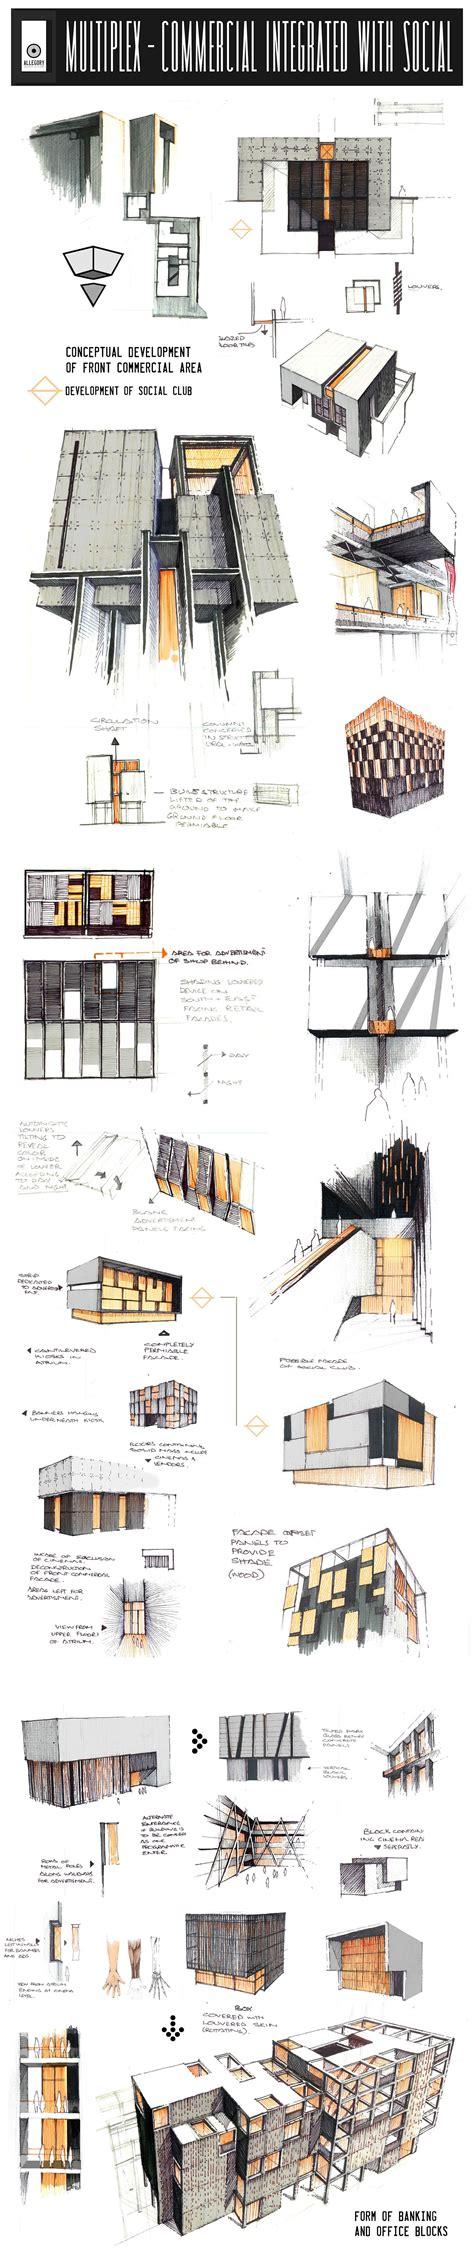 design proposal drawings professional design proposals under development on behance